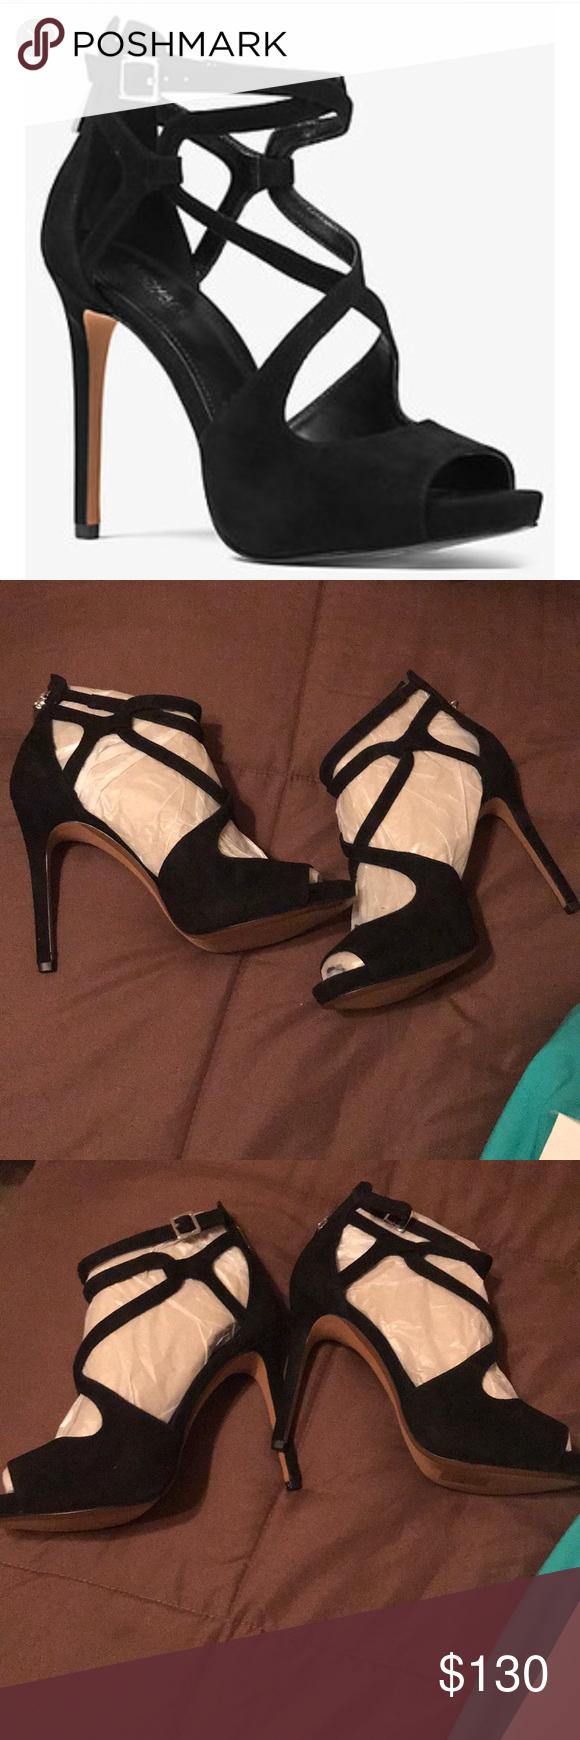 Michael Kors Catia Sandal Leather Size